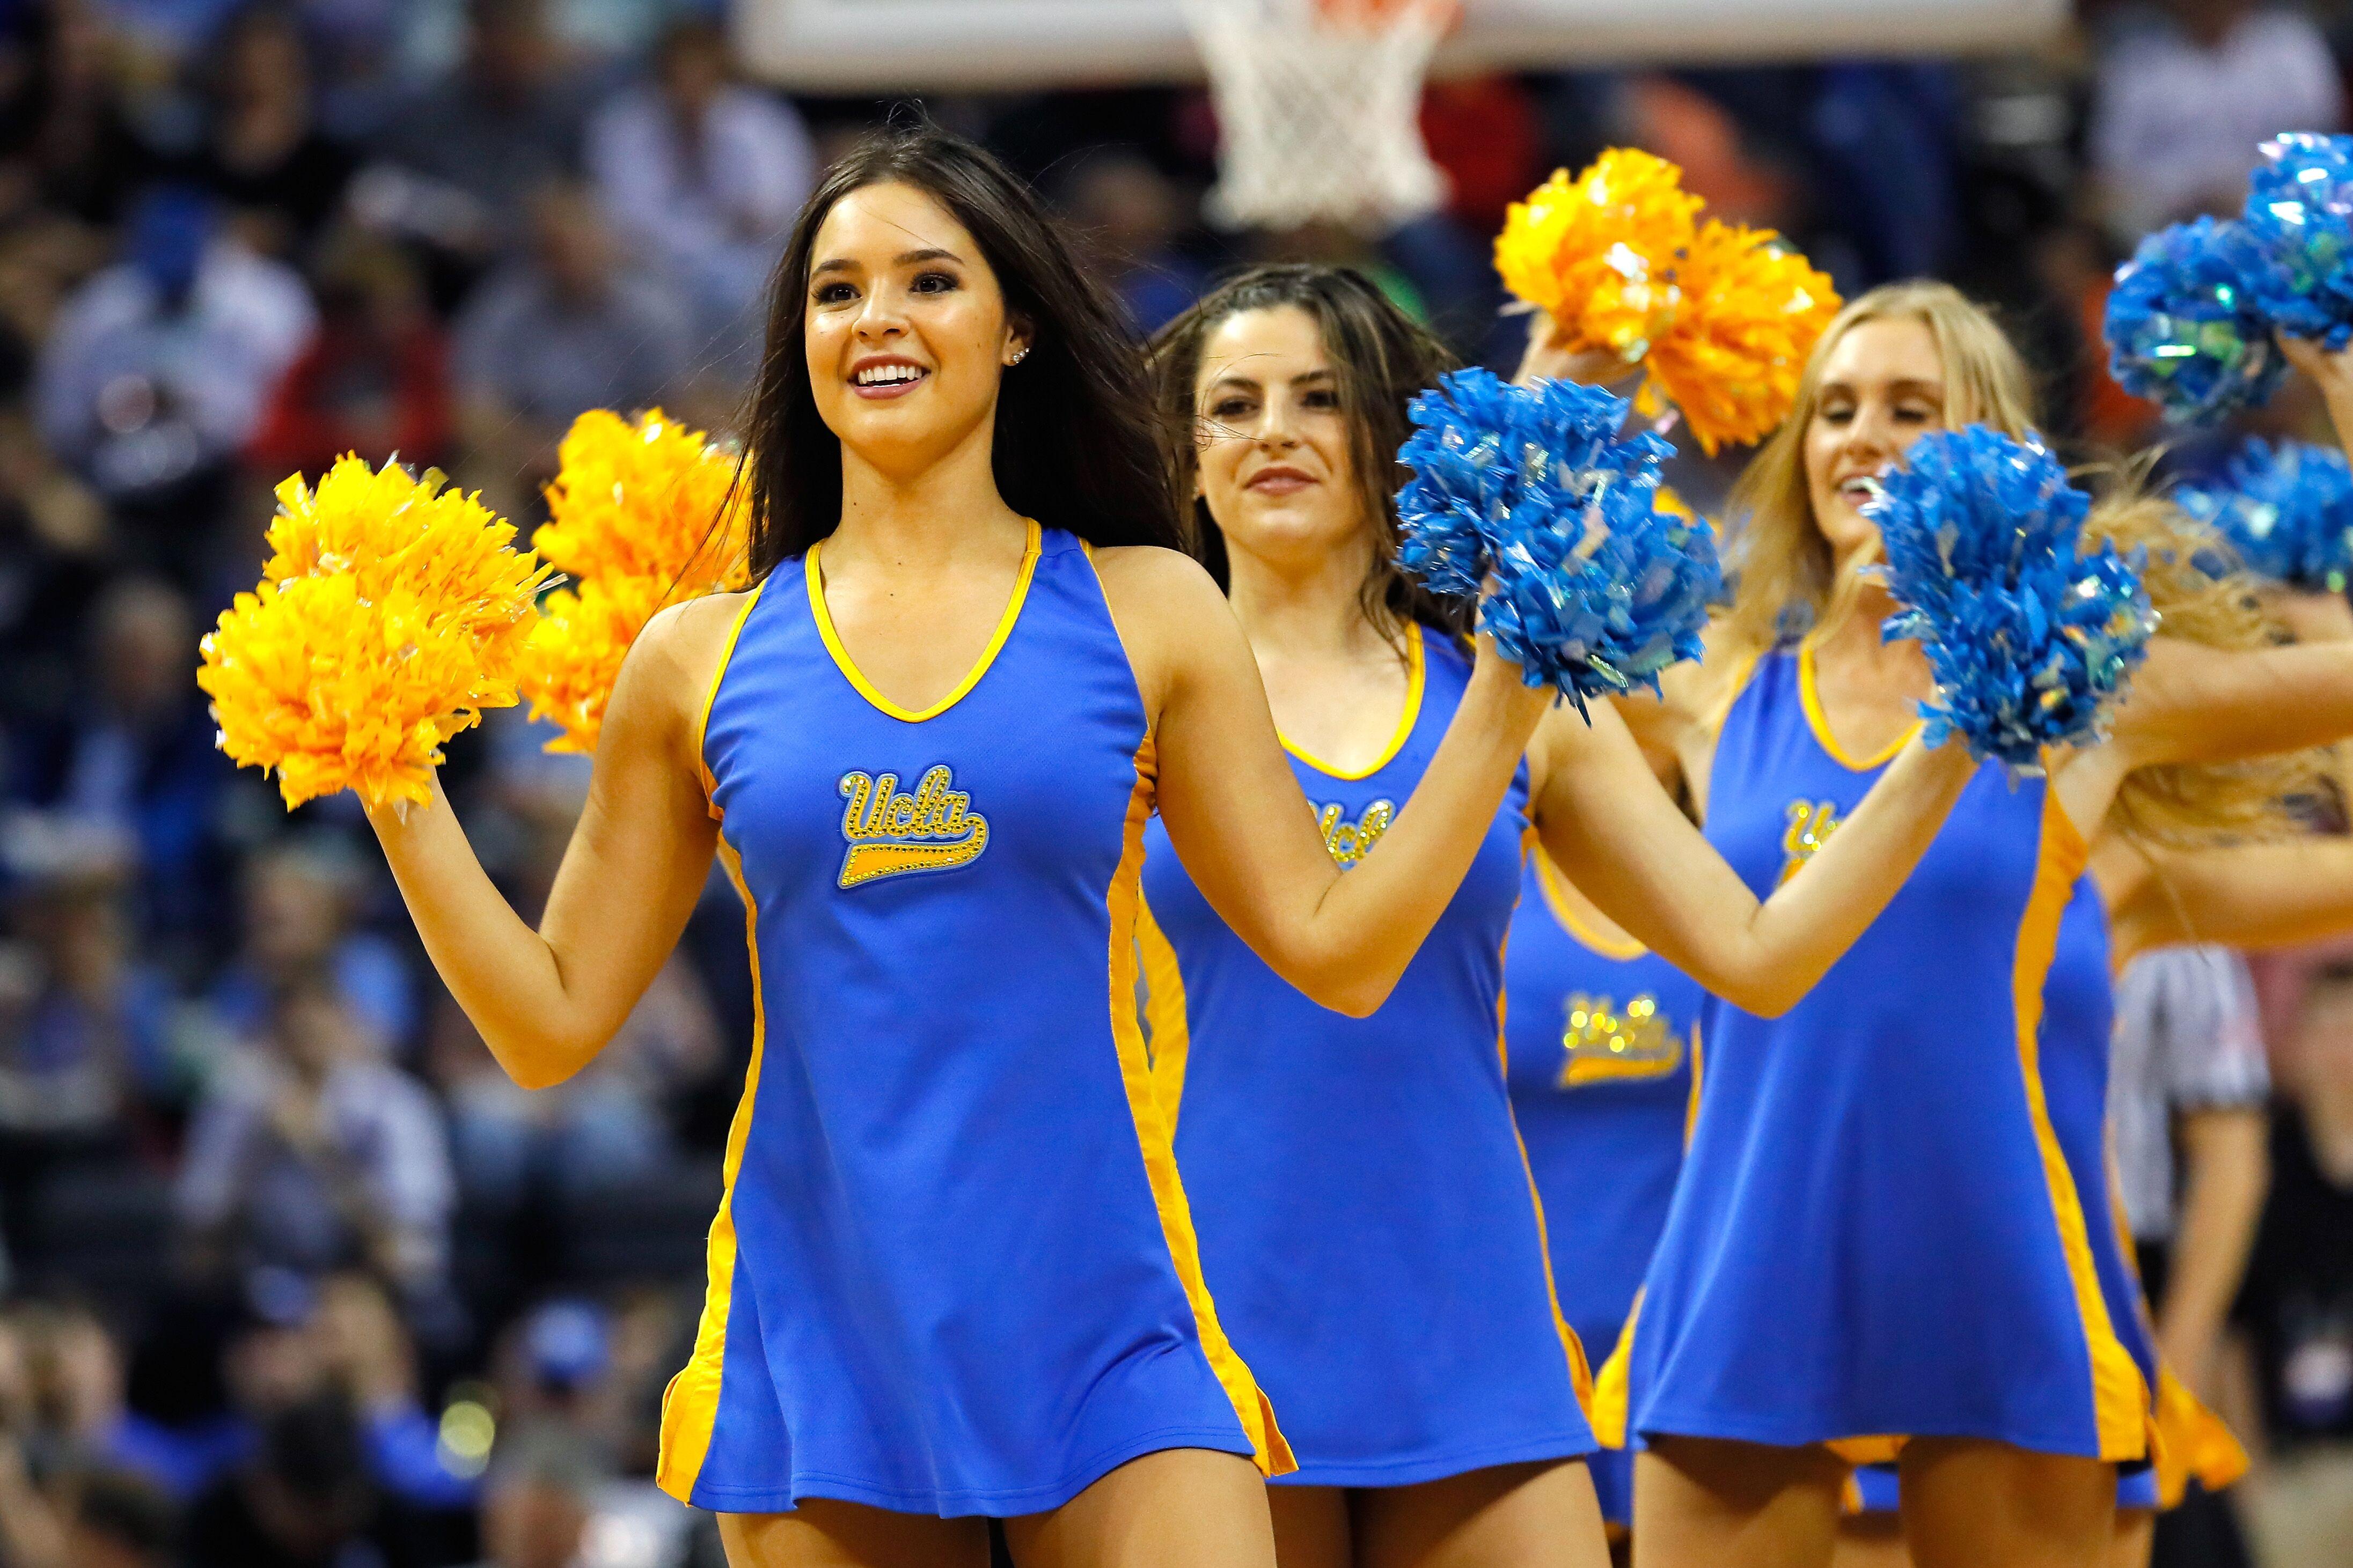 UCLA Basketball: The Women's and Men's 2017-18 journey begins